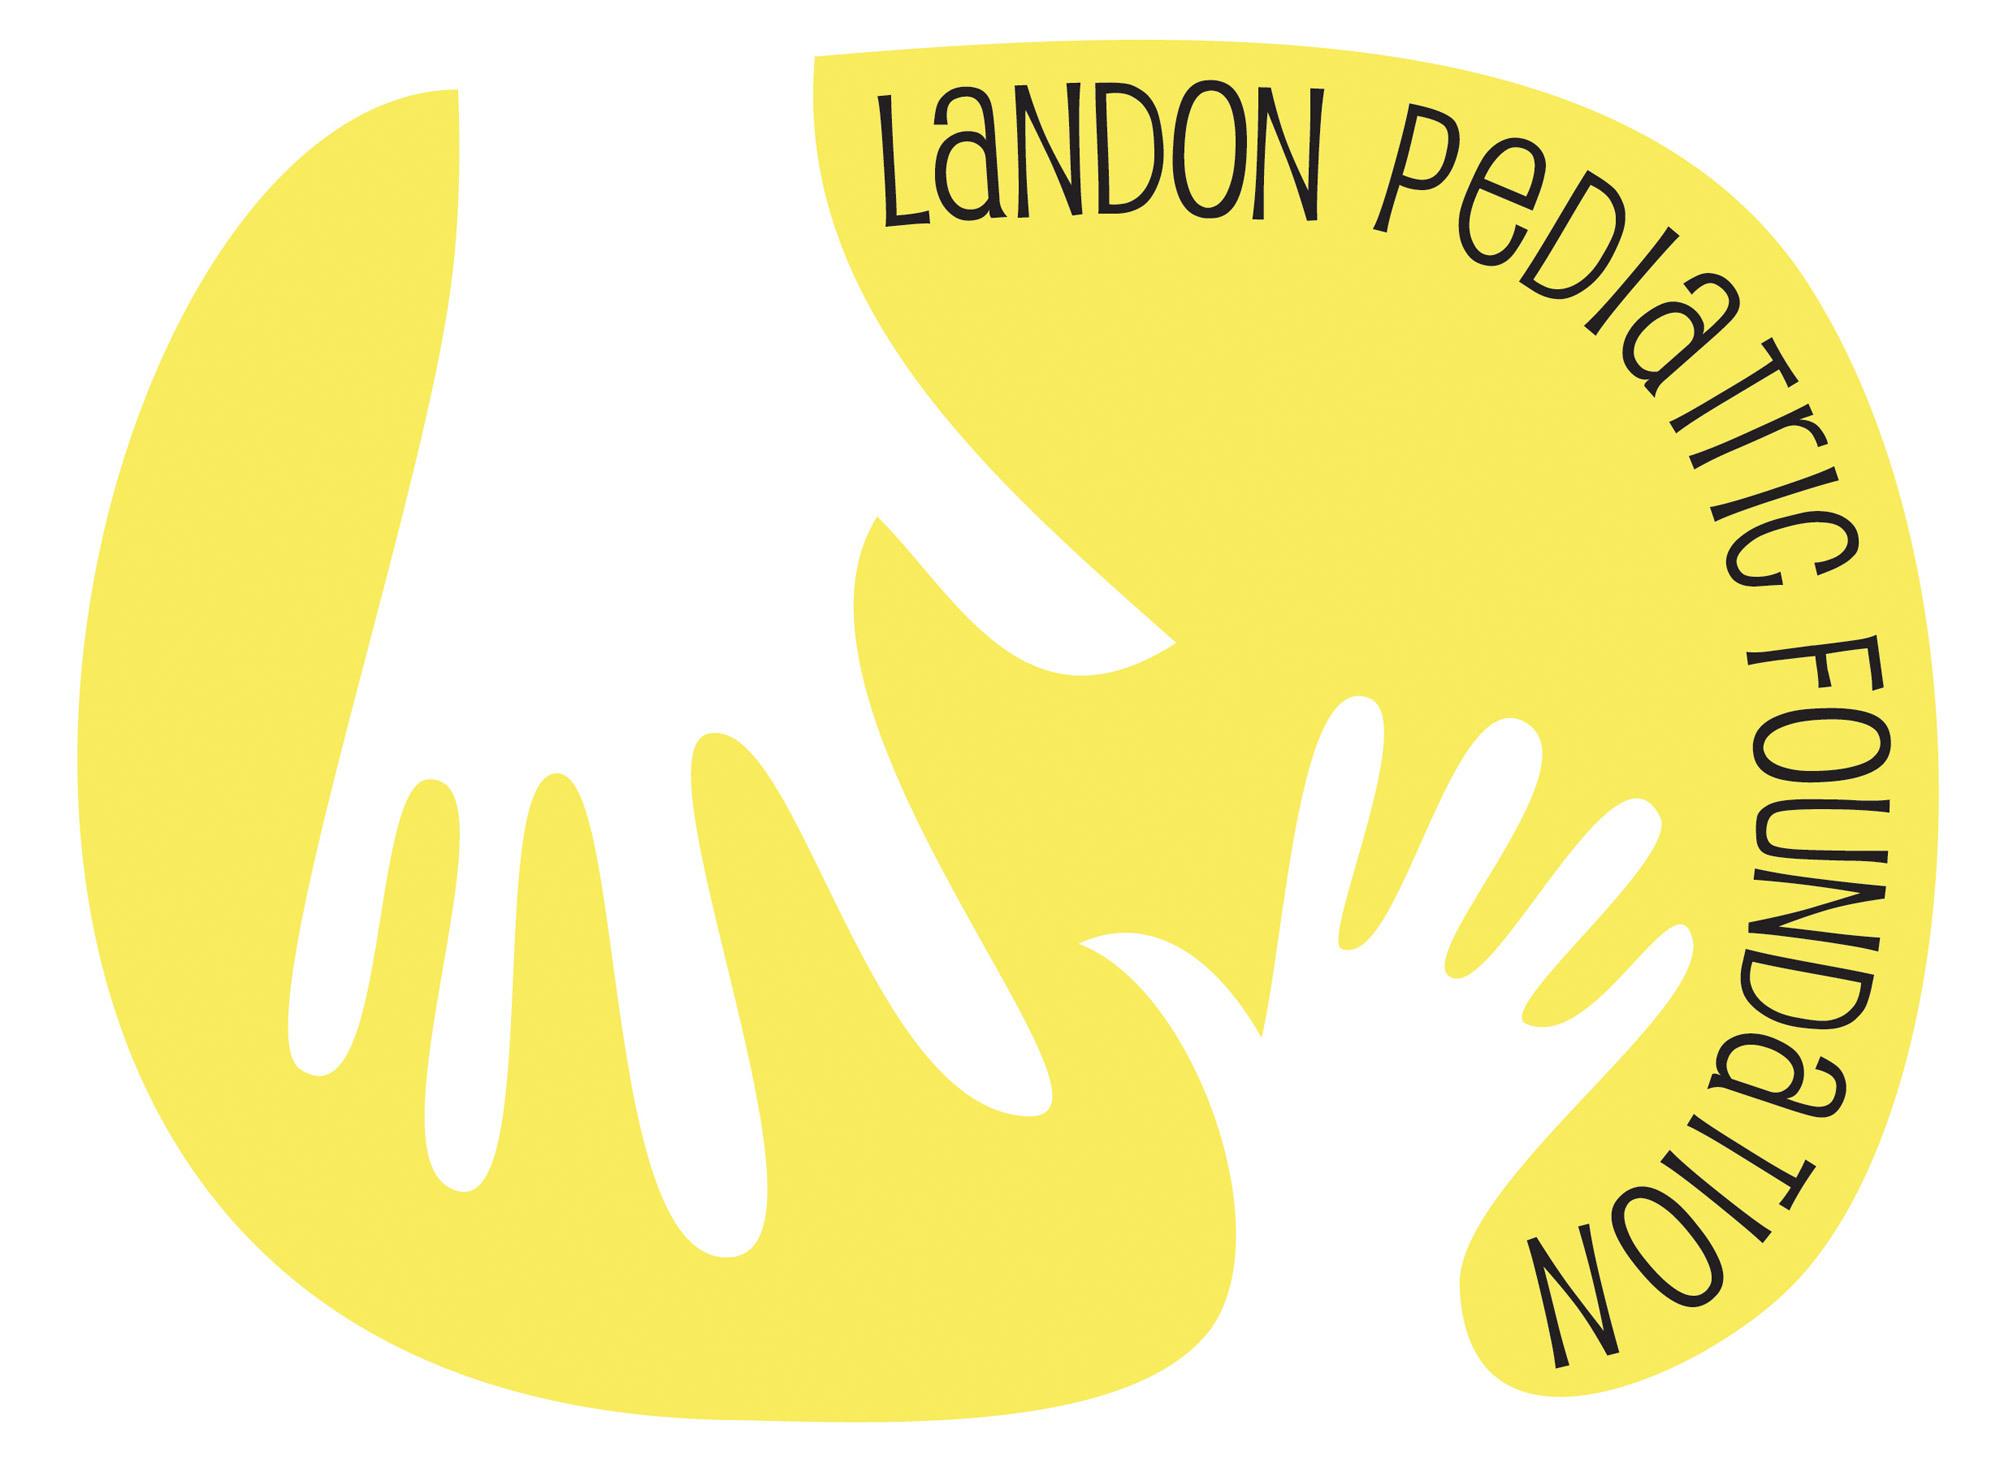 Landon_Pediatric_Foundation_Pic.jpg